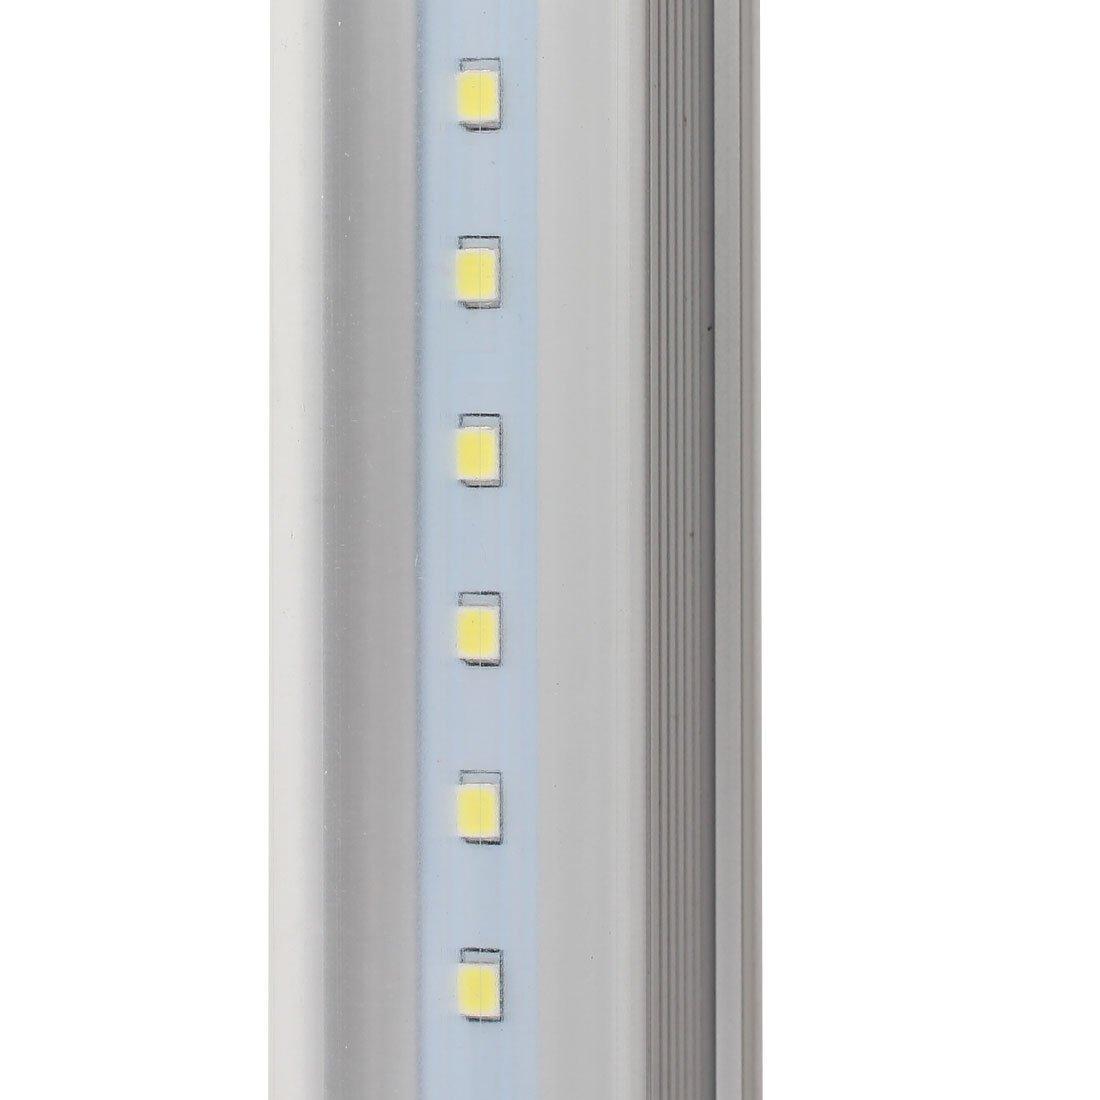 eDealMax CA 85-265V 9W T8 2835SMD LED integrada tubo de la lámpara de luz Blanca pura 60cm Longitud: Amazon.com: Industrial & Scientific